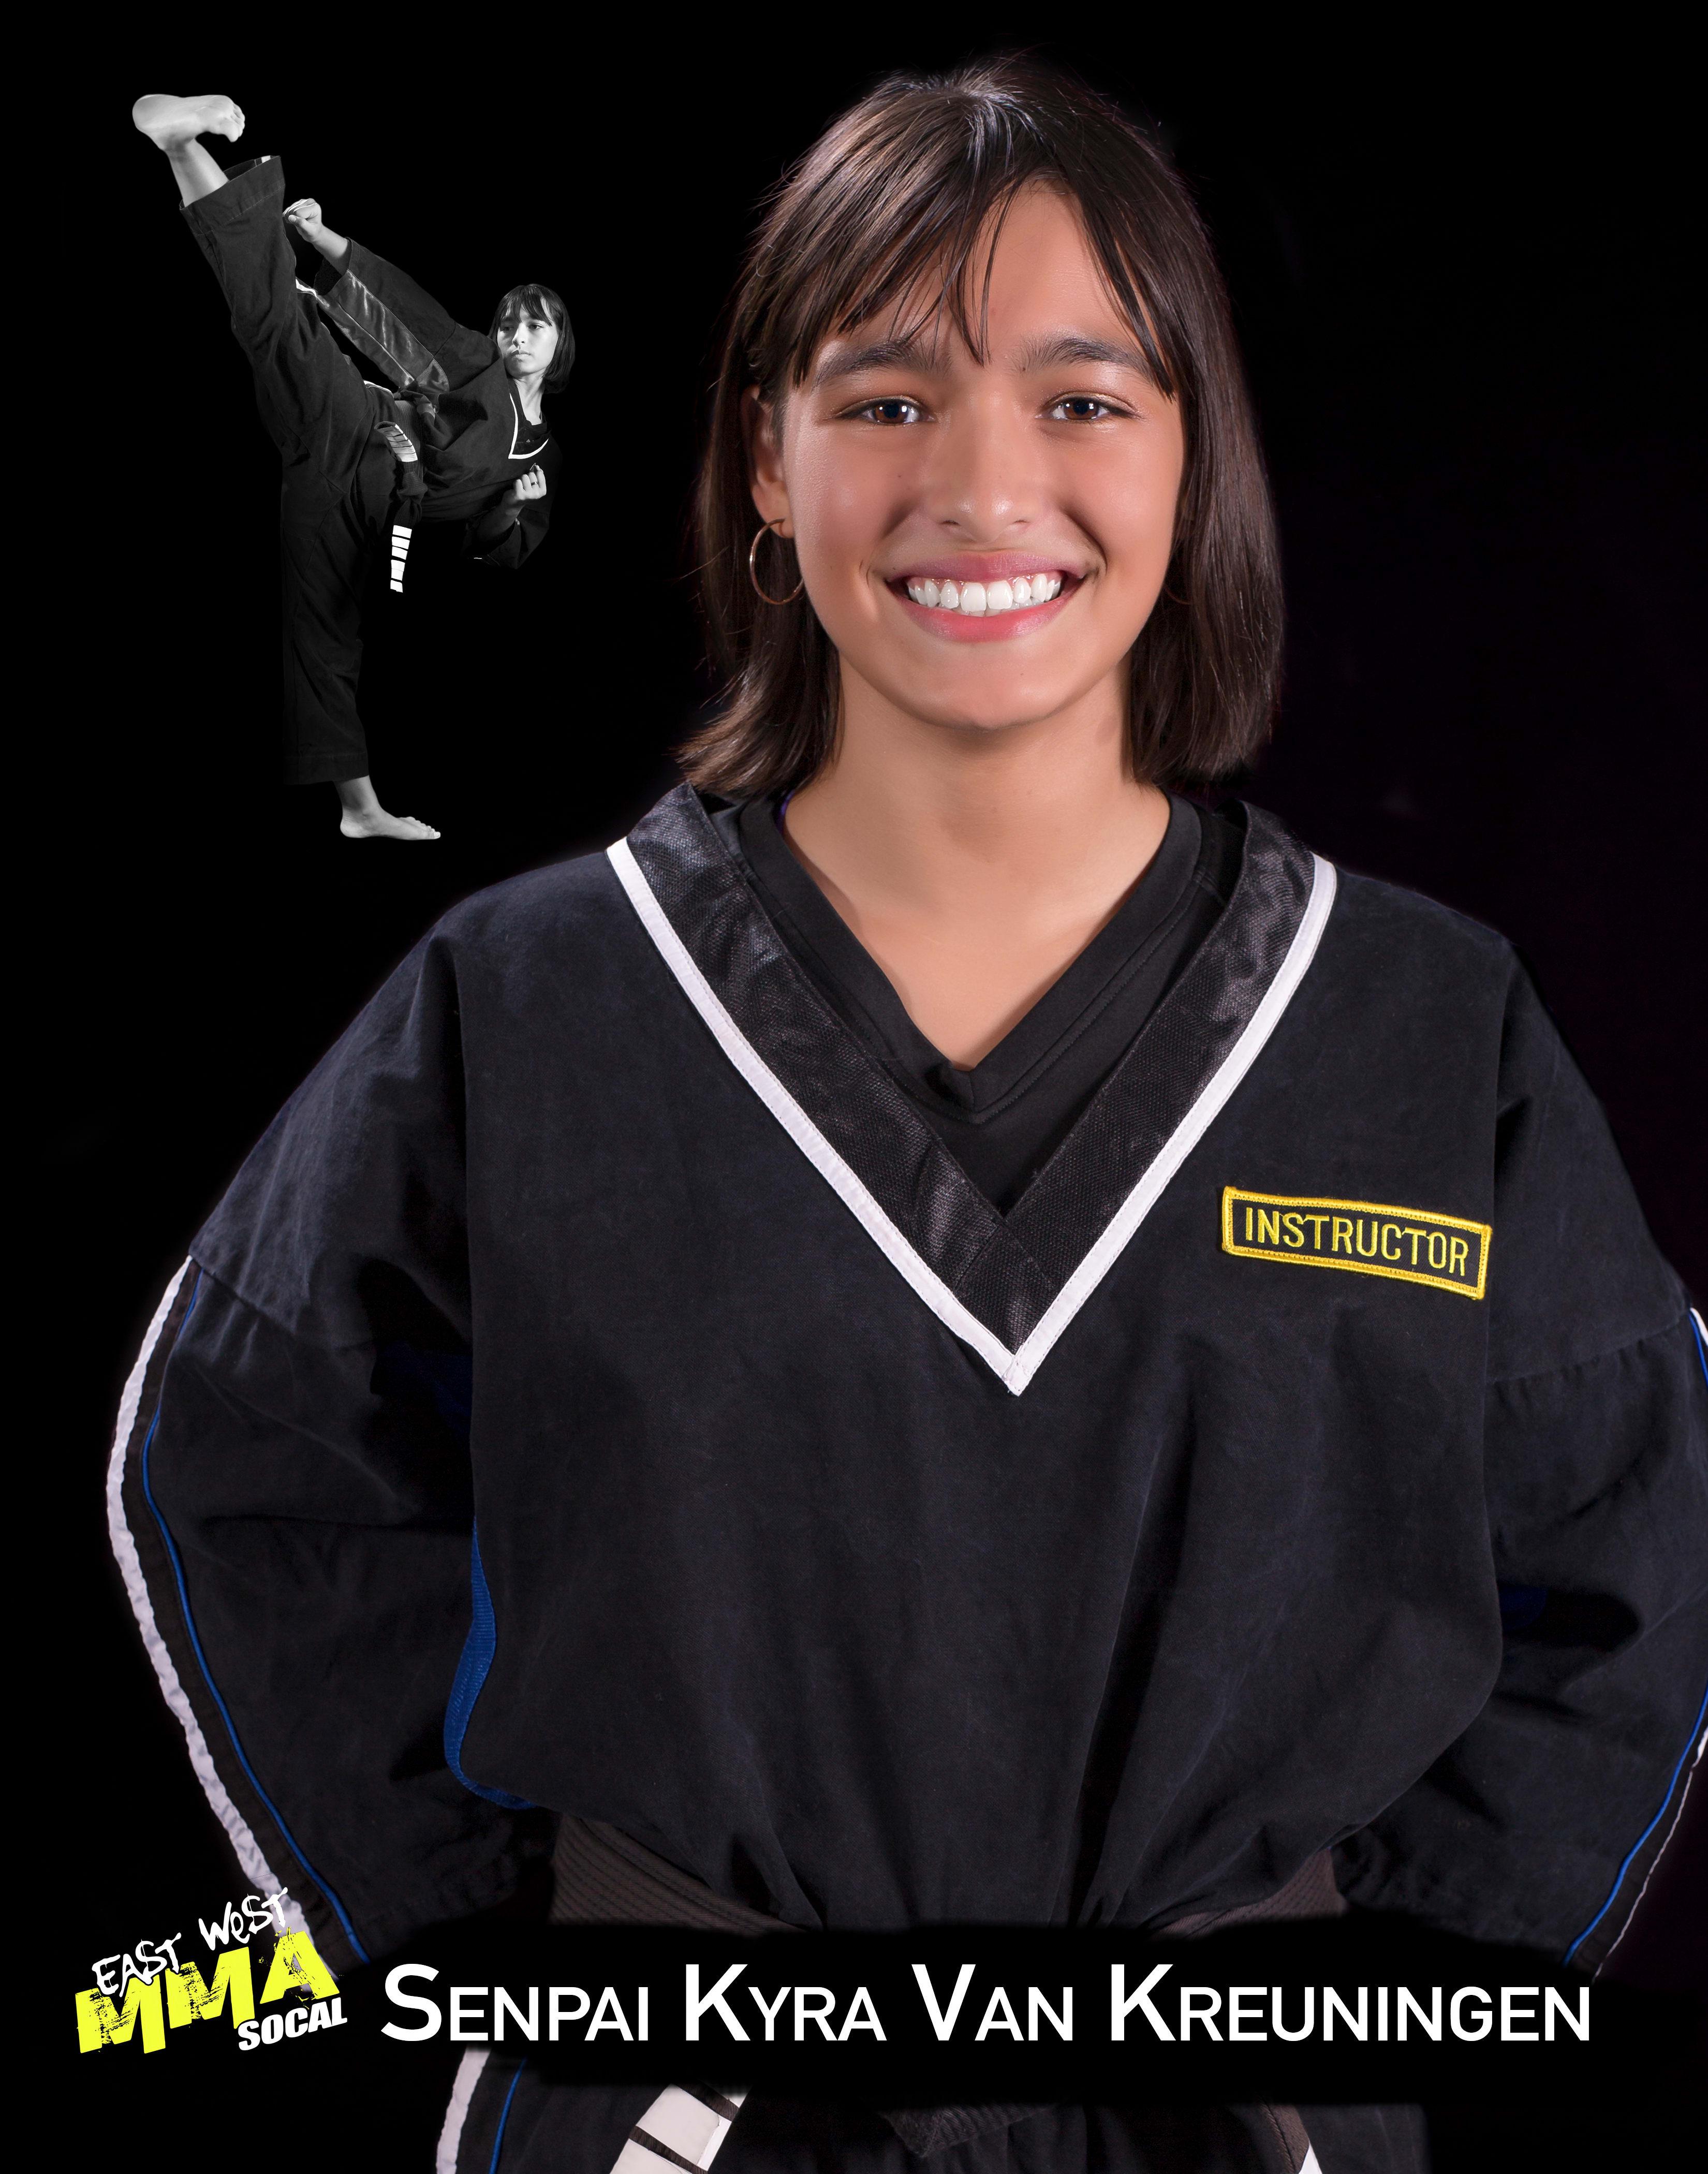 Senpai Kyra in Escondido - East West MMA SoCal